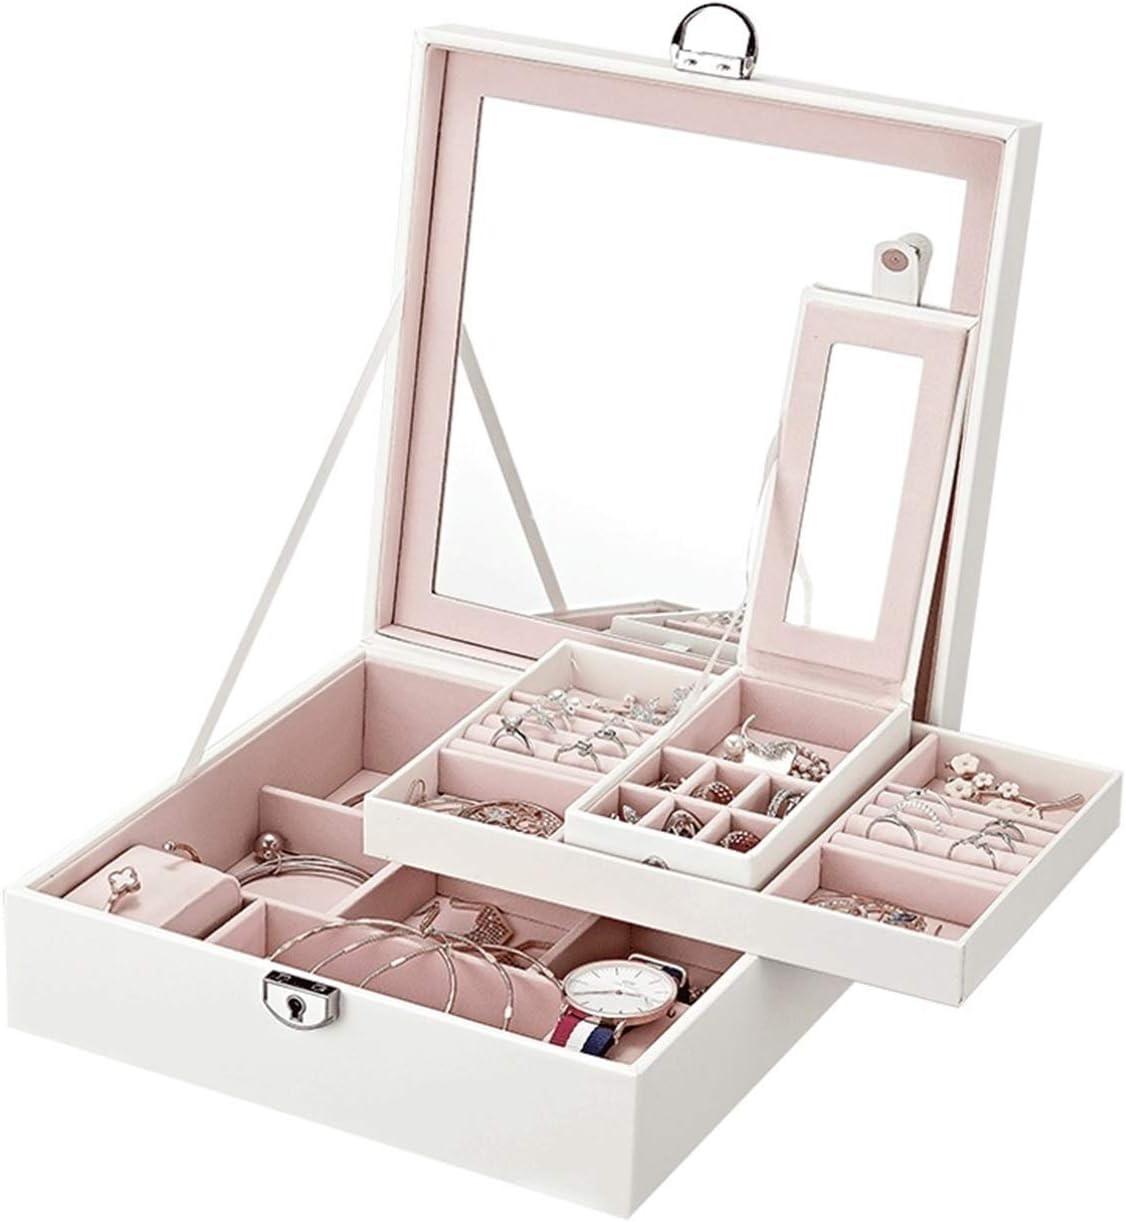 dandanshop Jewelry Box Albuquerque Mall European Brace Storage Excellent Large-Capacity